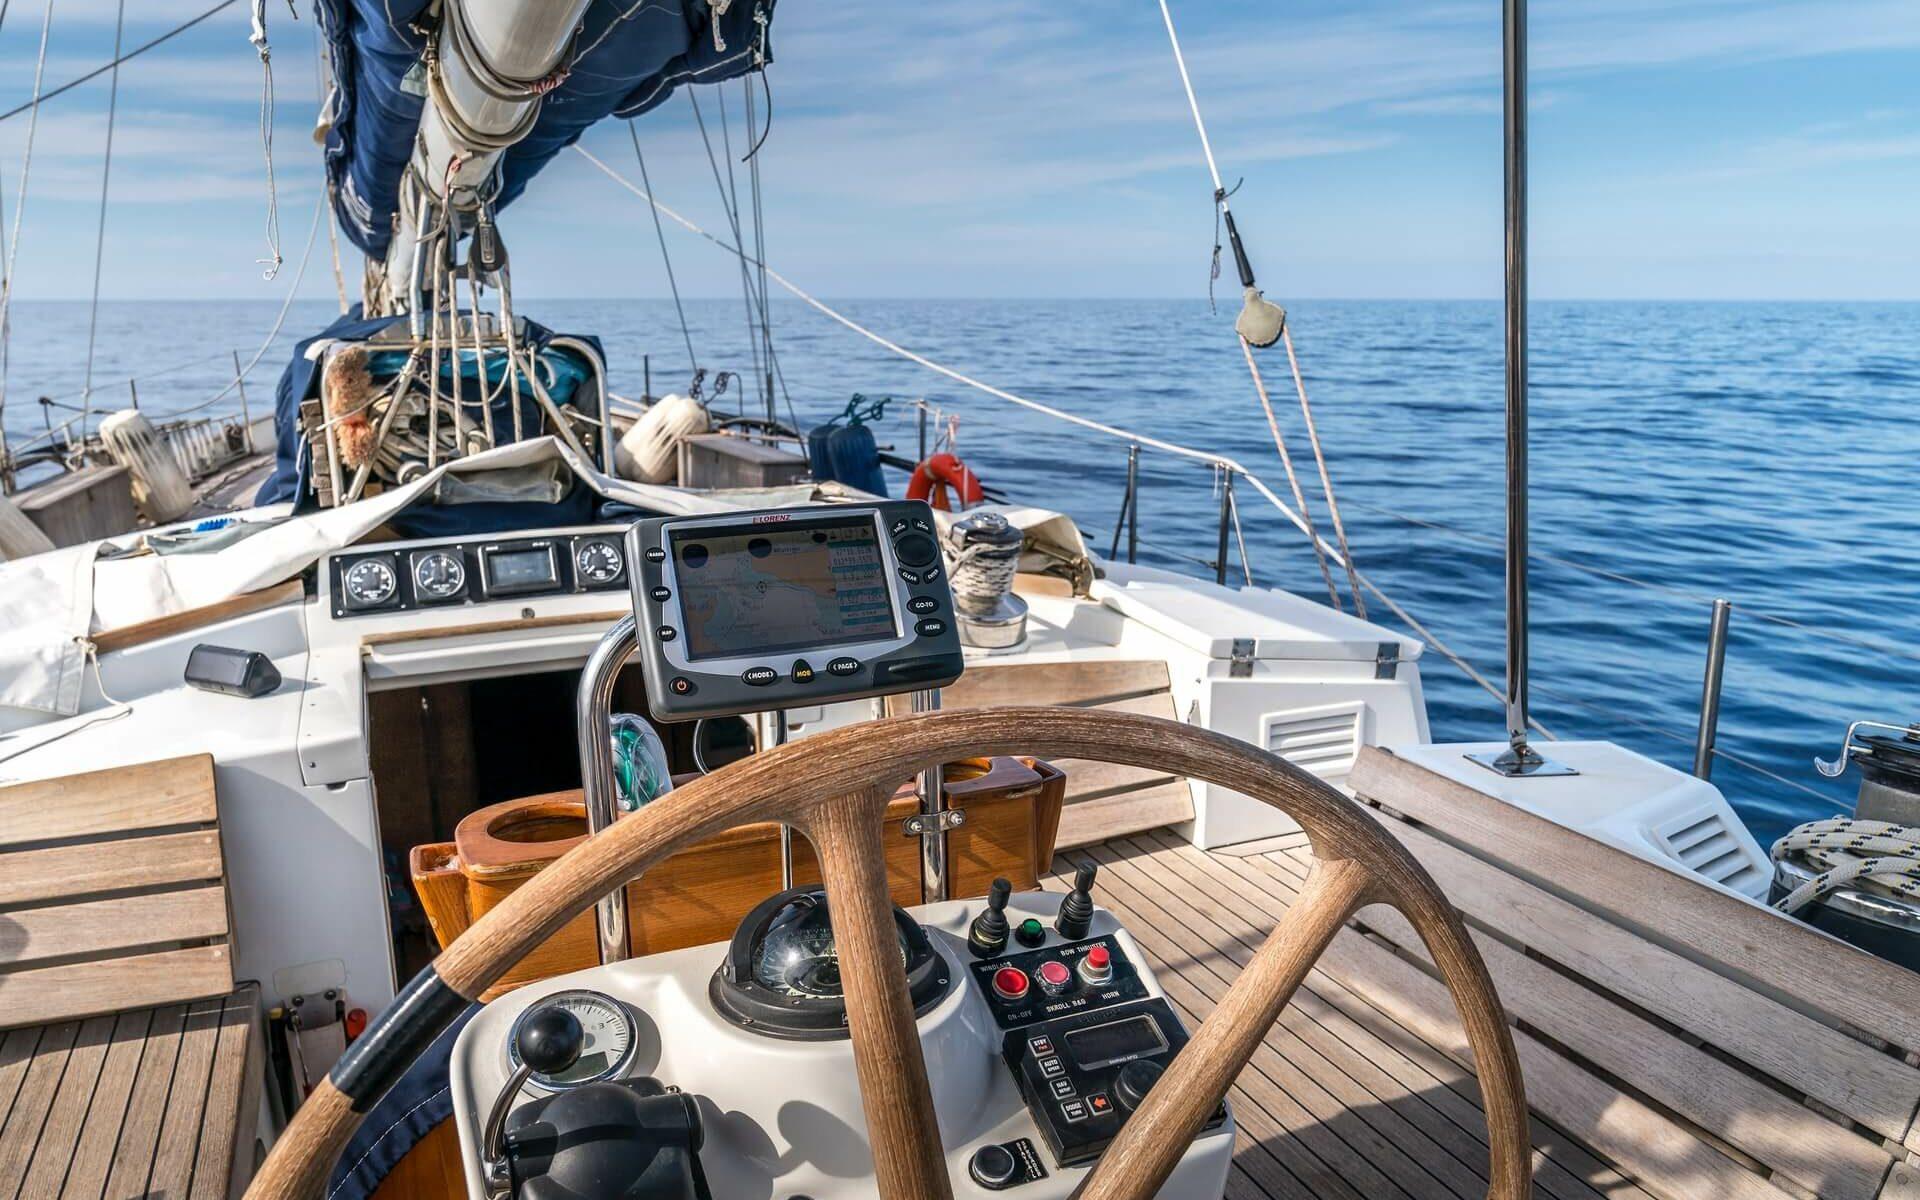 various sailing gear for global circumnavigation